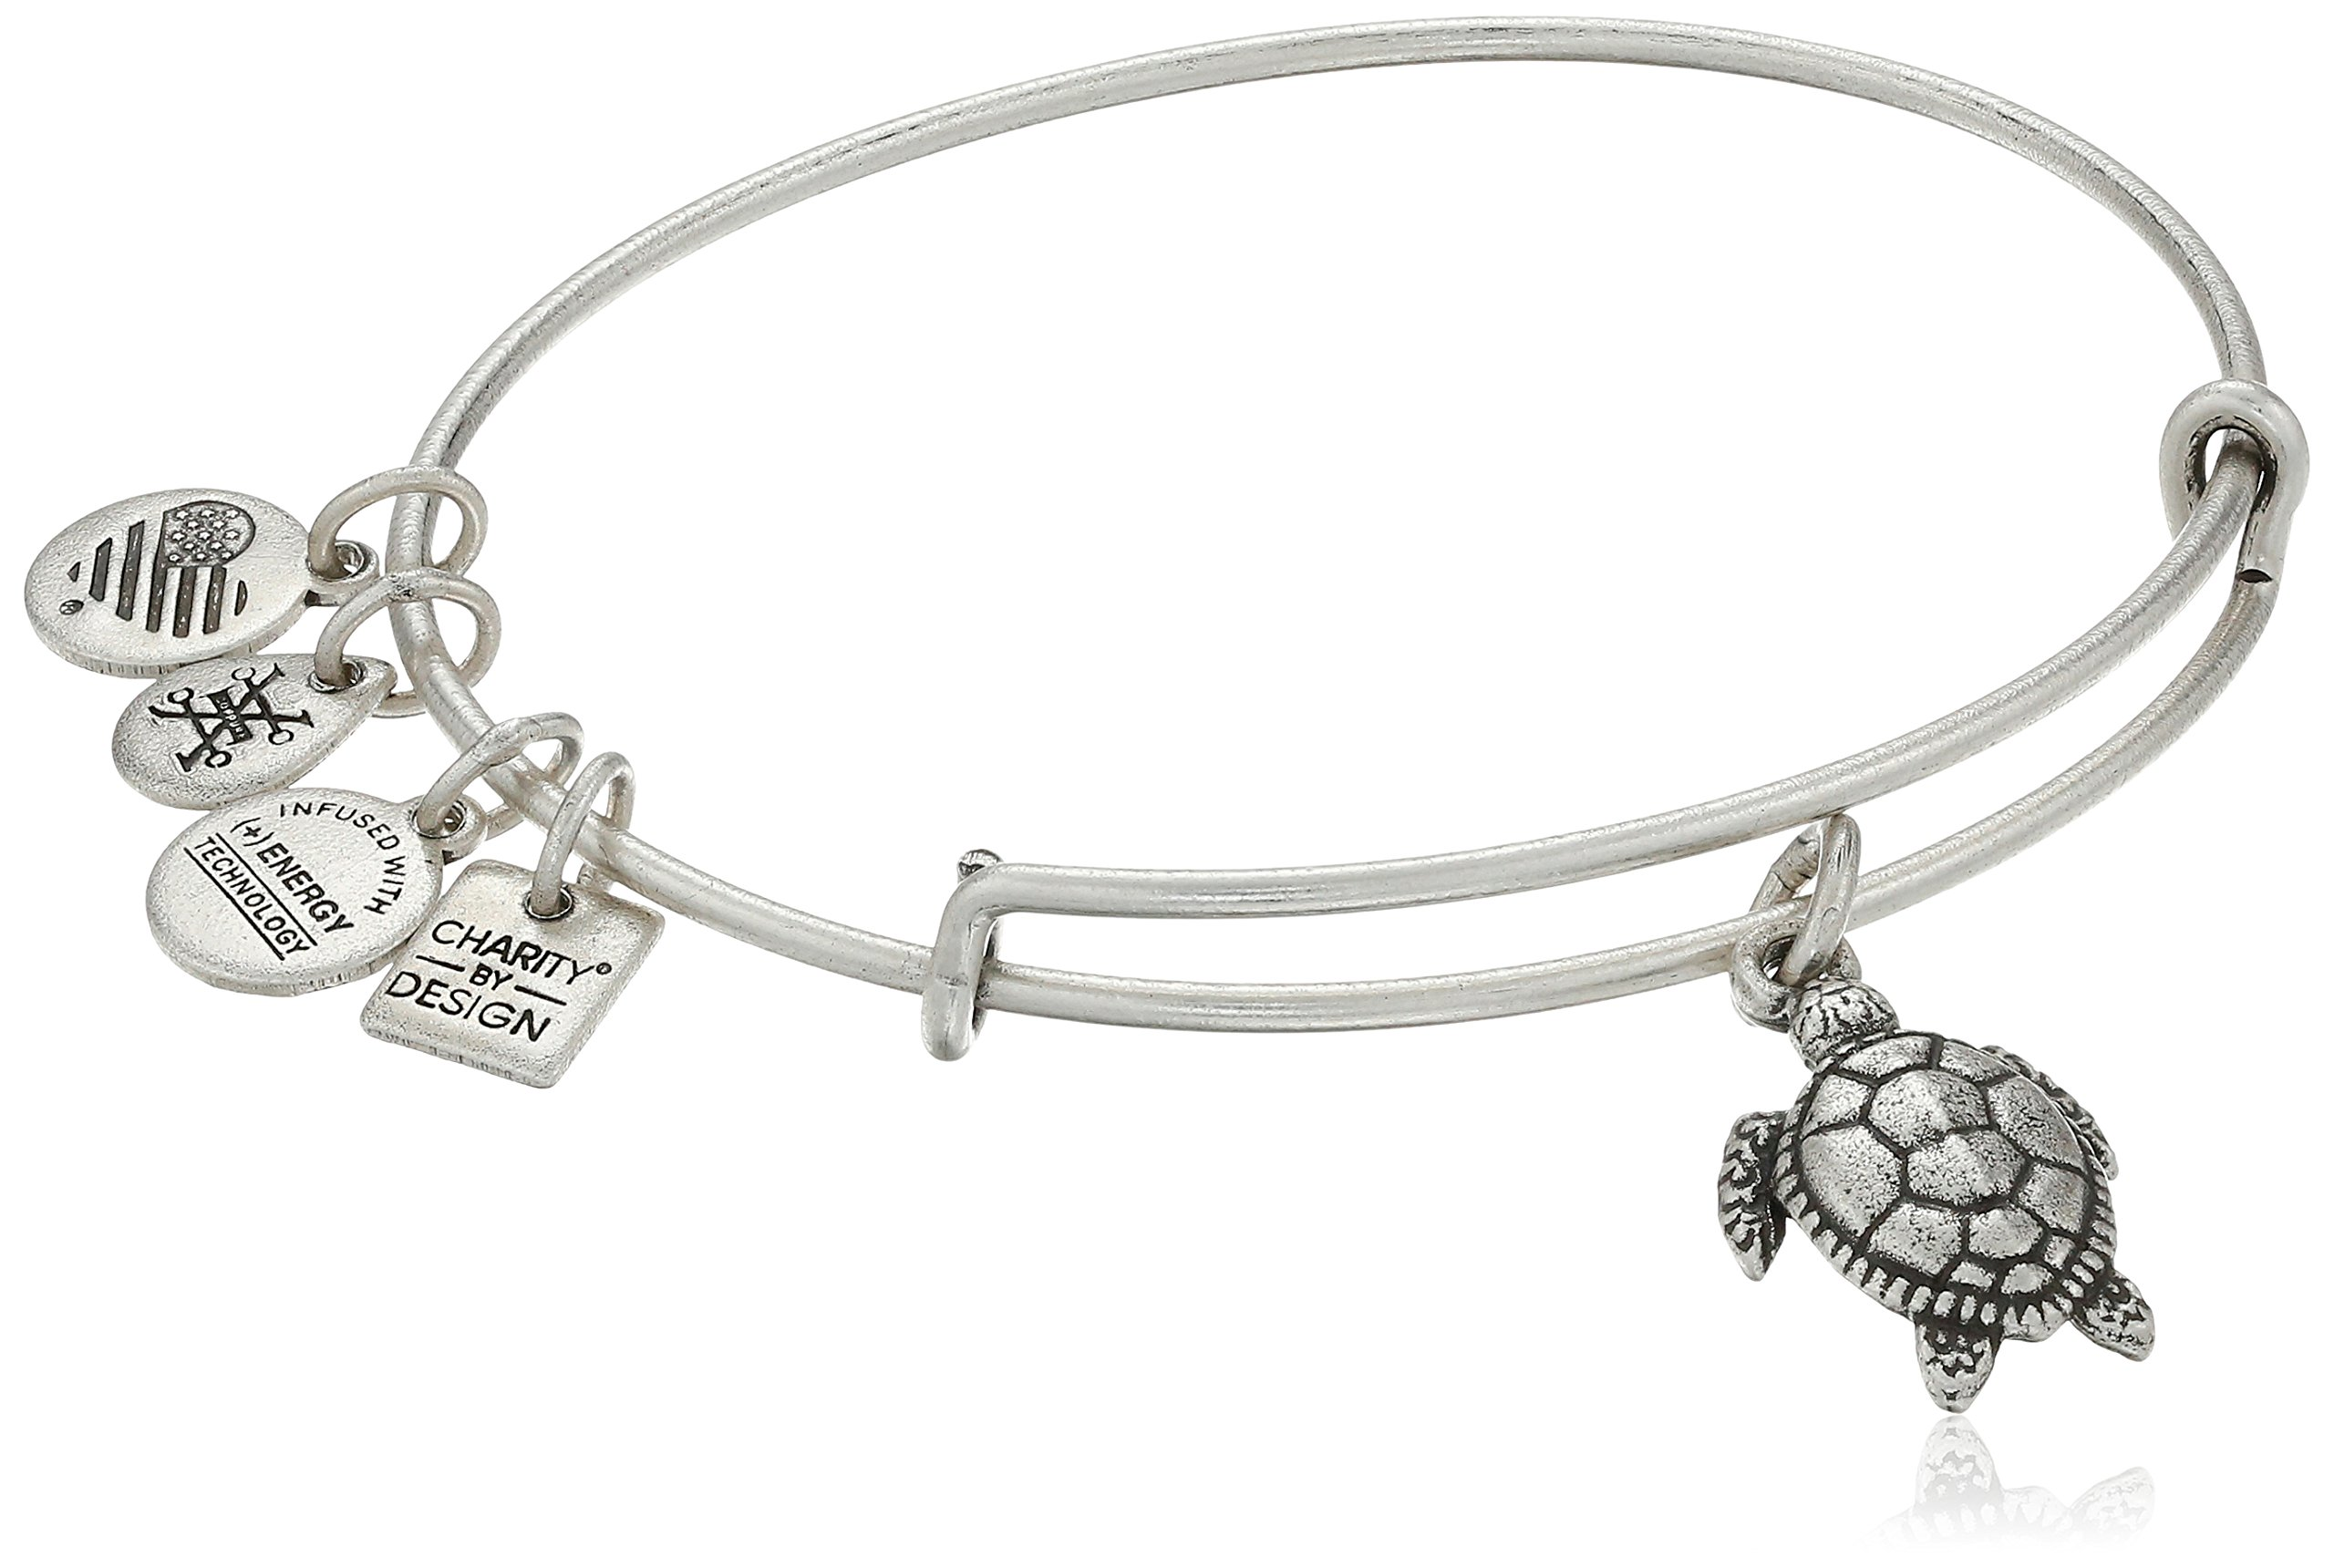 Alex and Ani Charity By Design Turtle Rafaelian Silver Bangle Bracelet by Alex and Ani